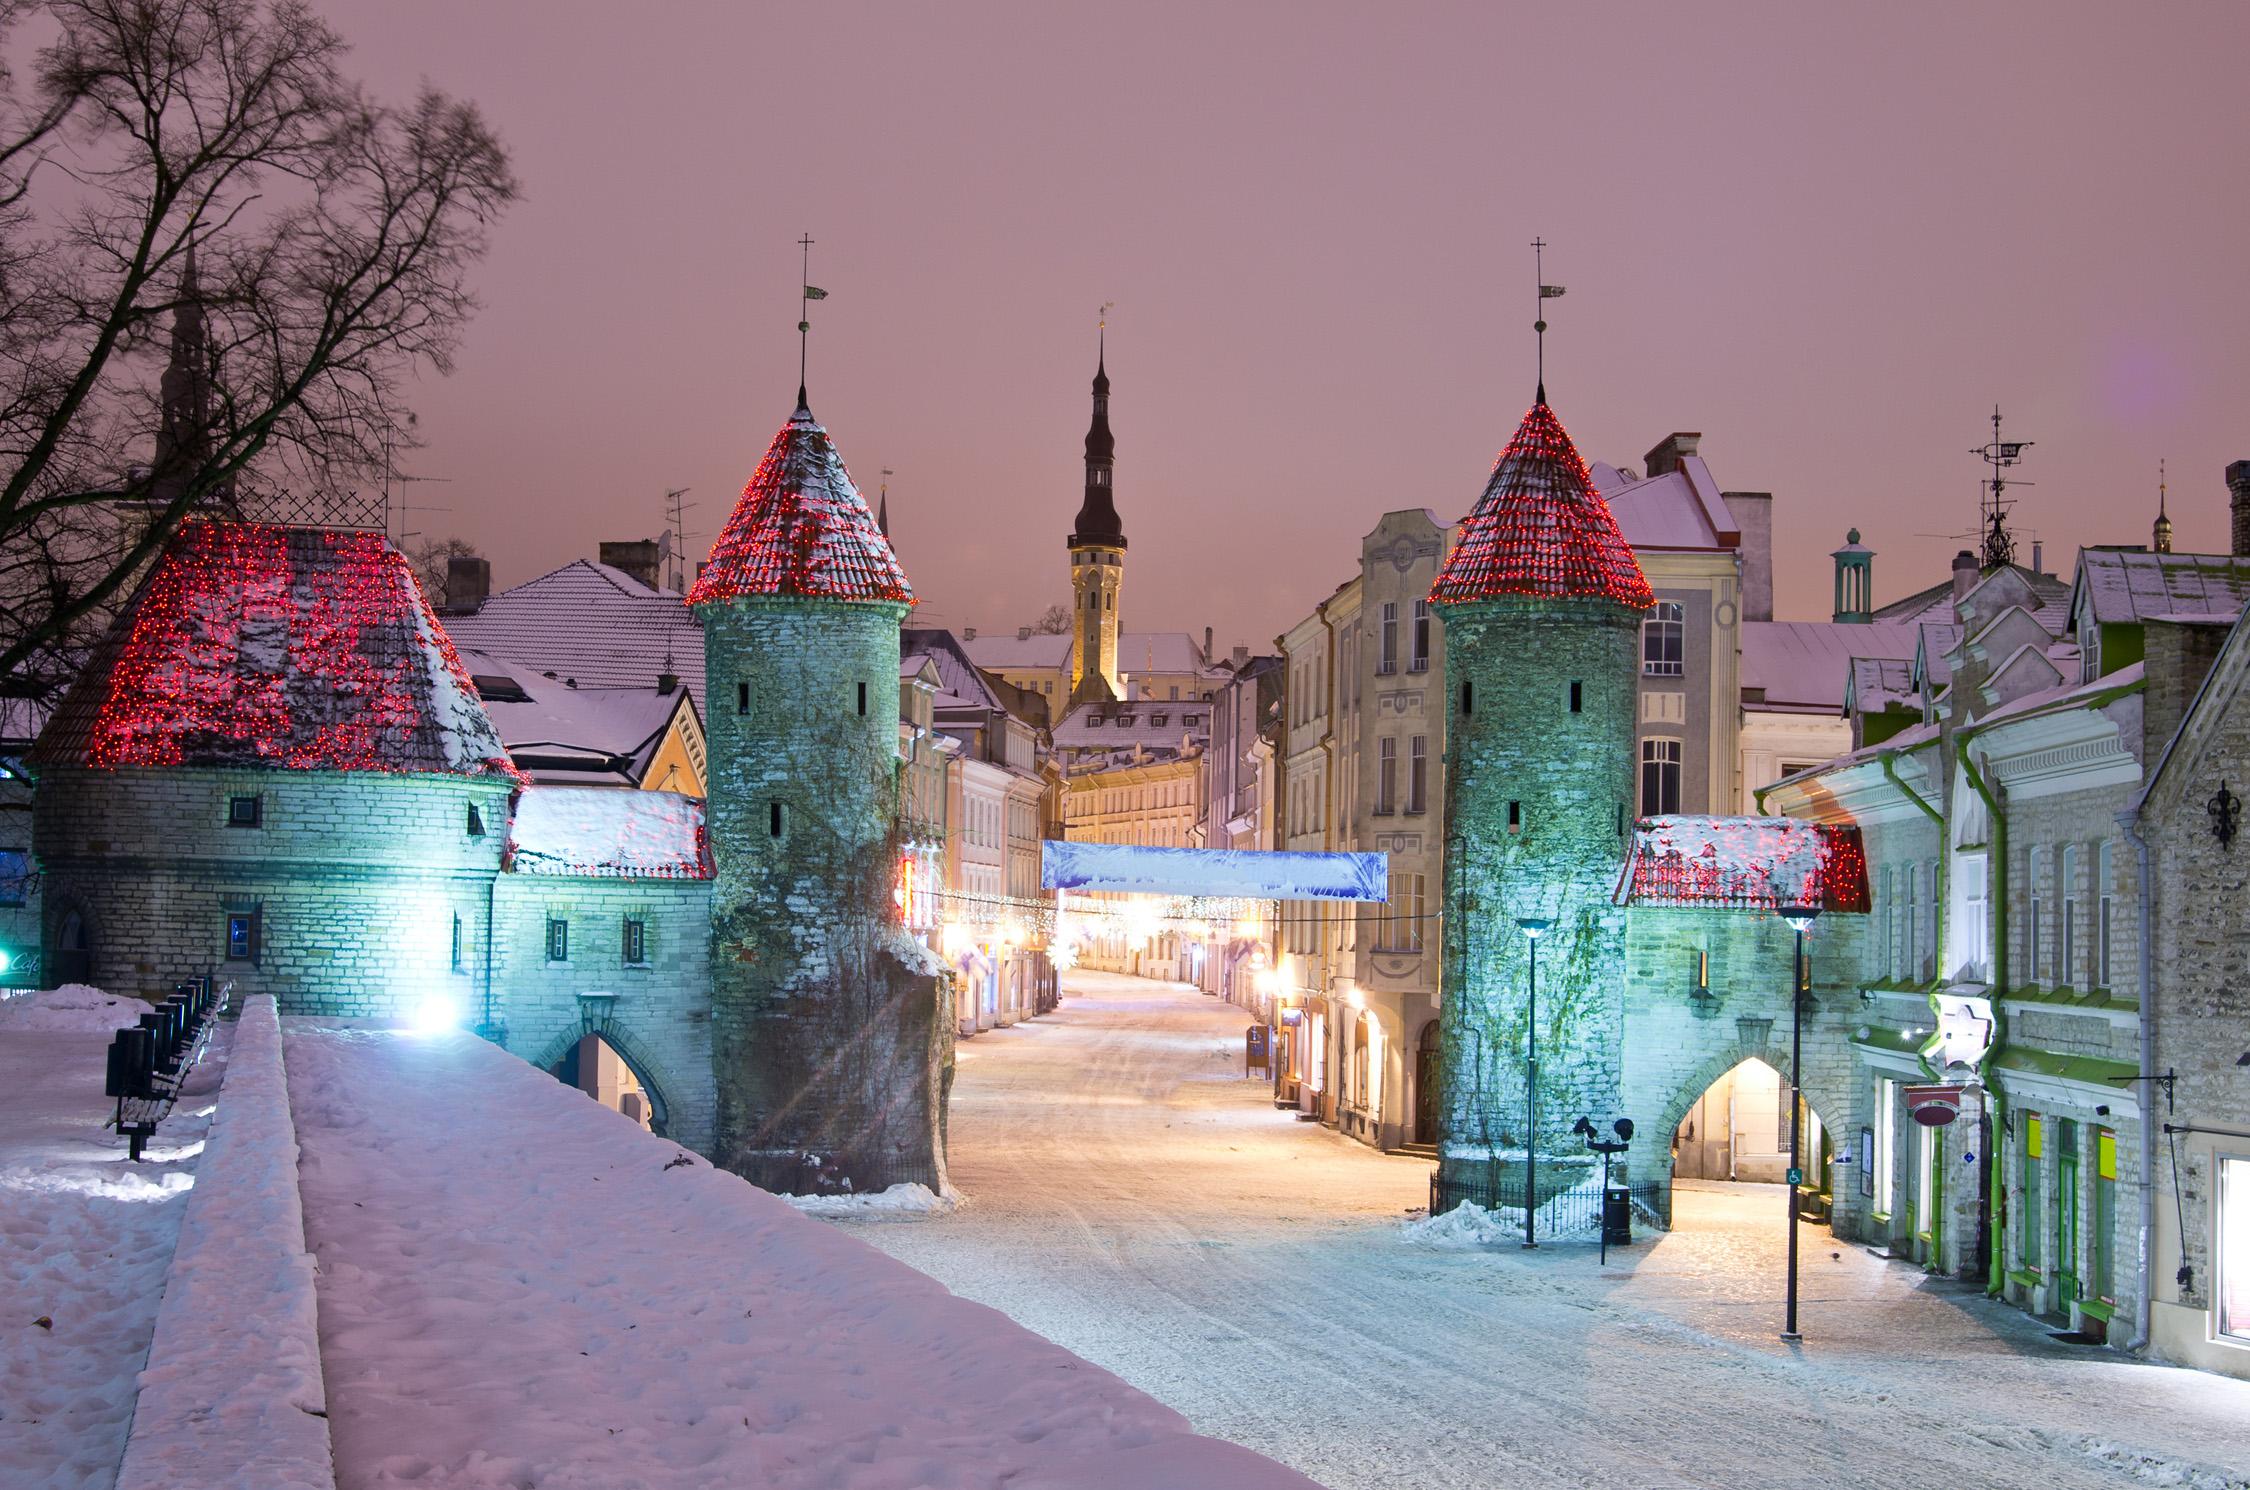 Flug Und Hotel Tallinn